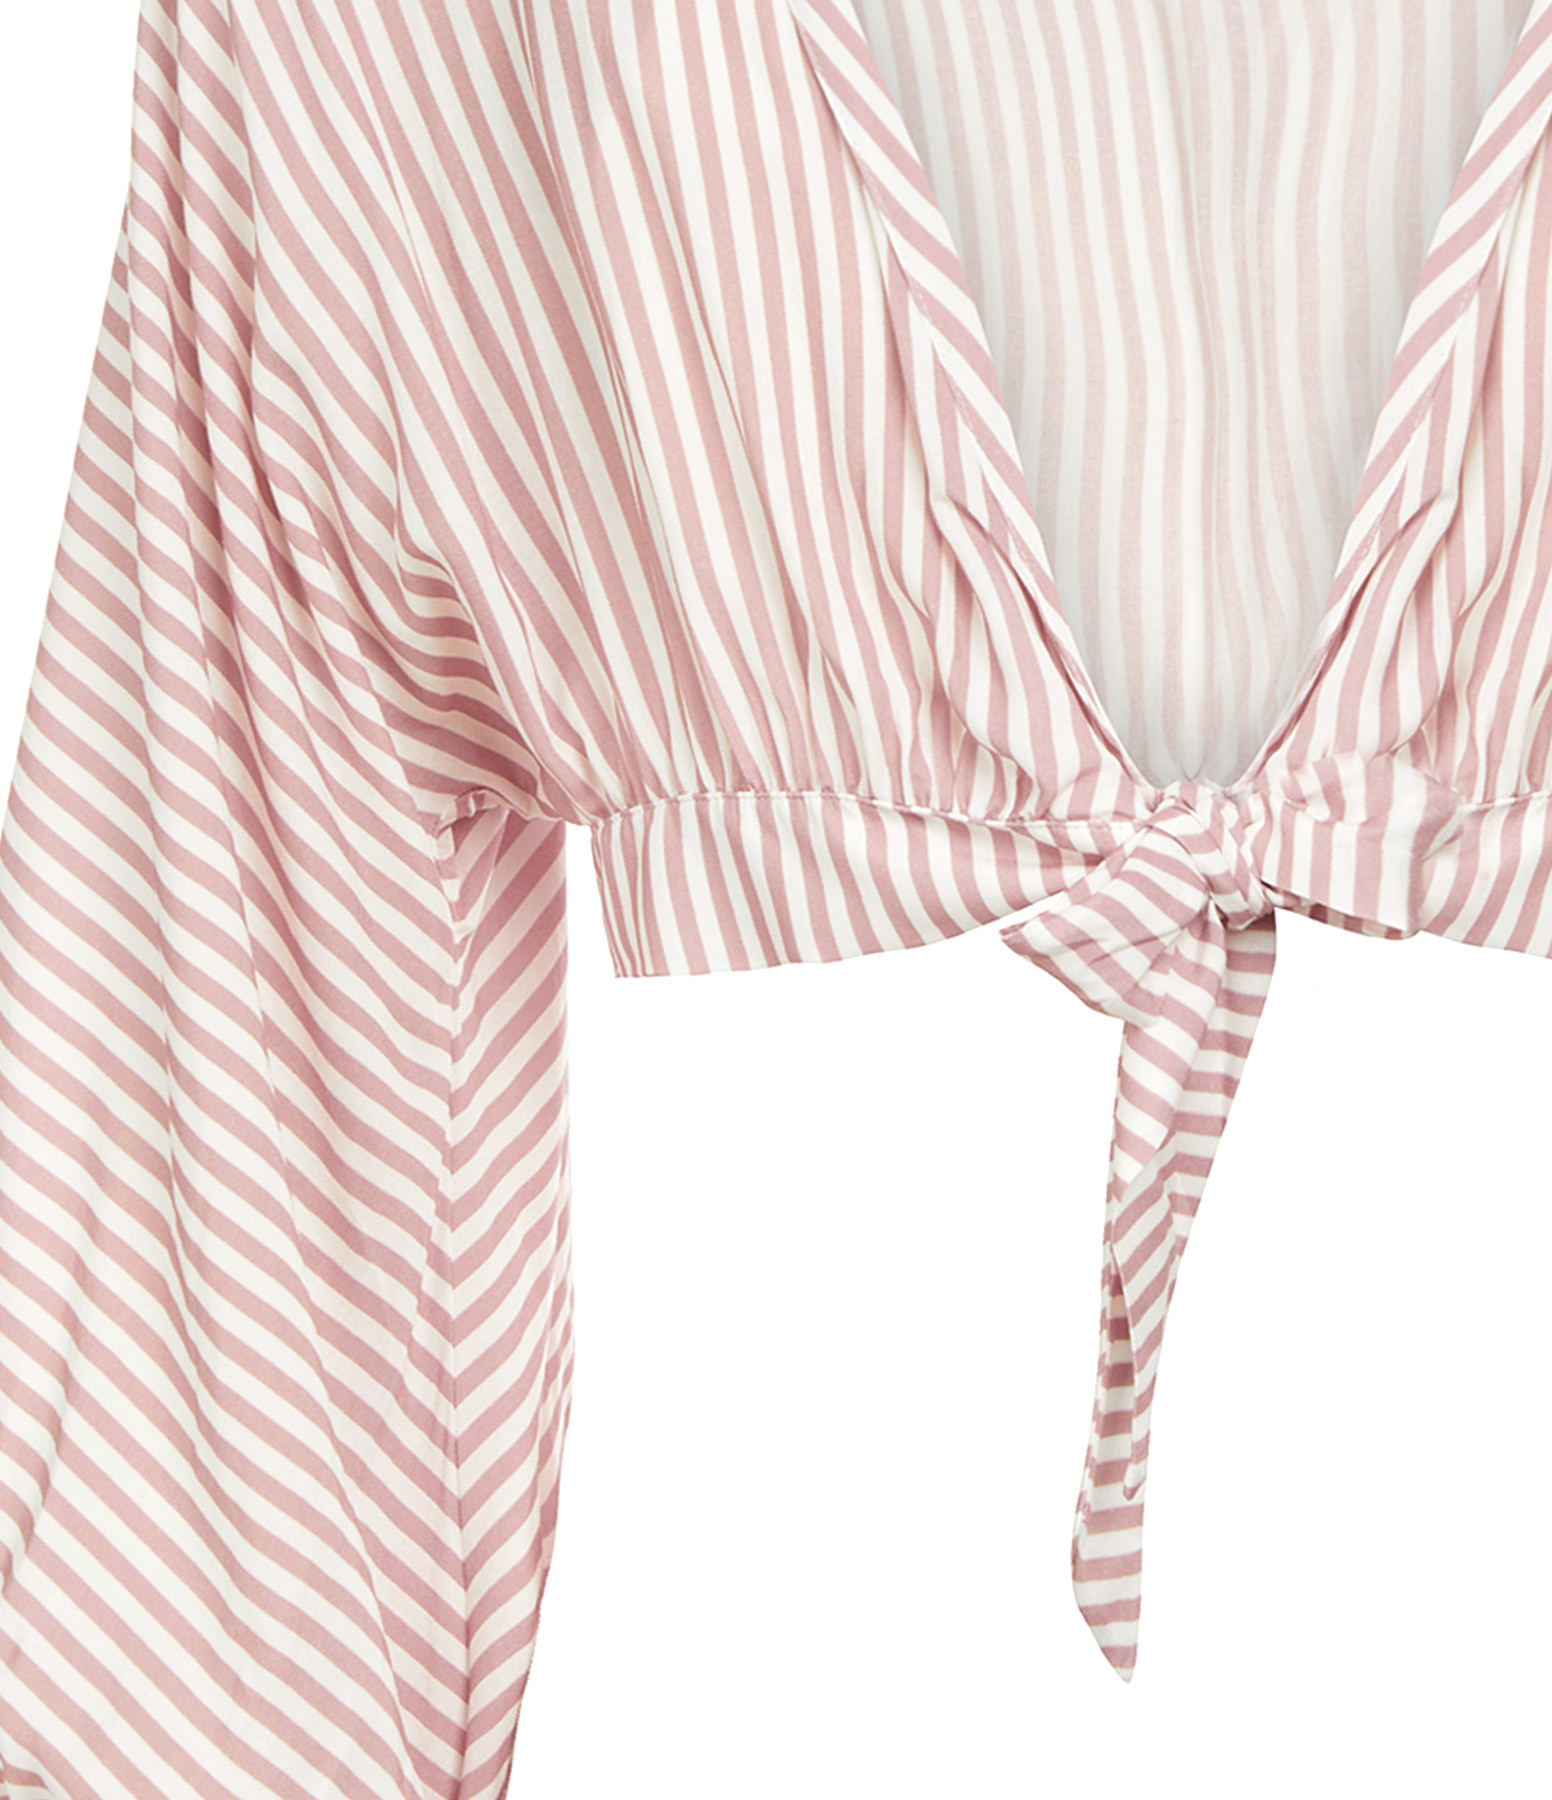 TATIANE DE FREITAS - Top Coton Rayures Rose